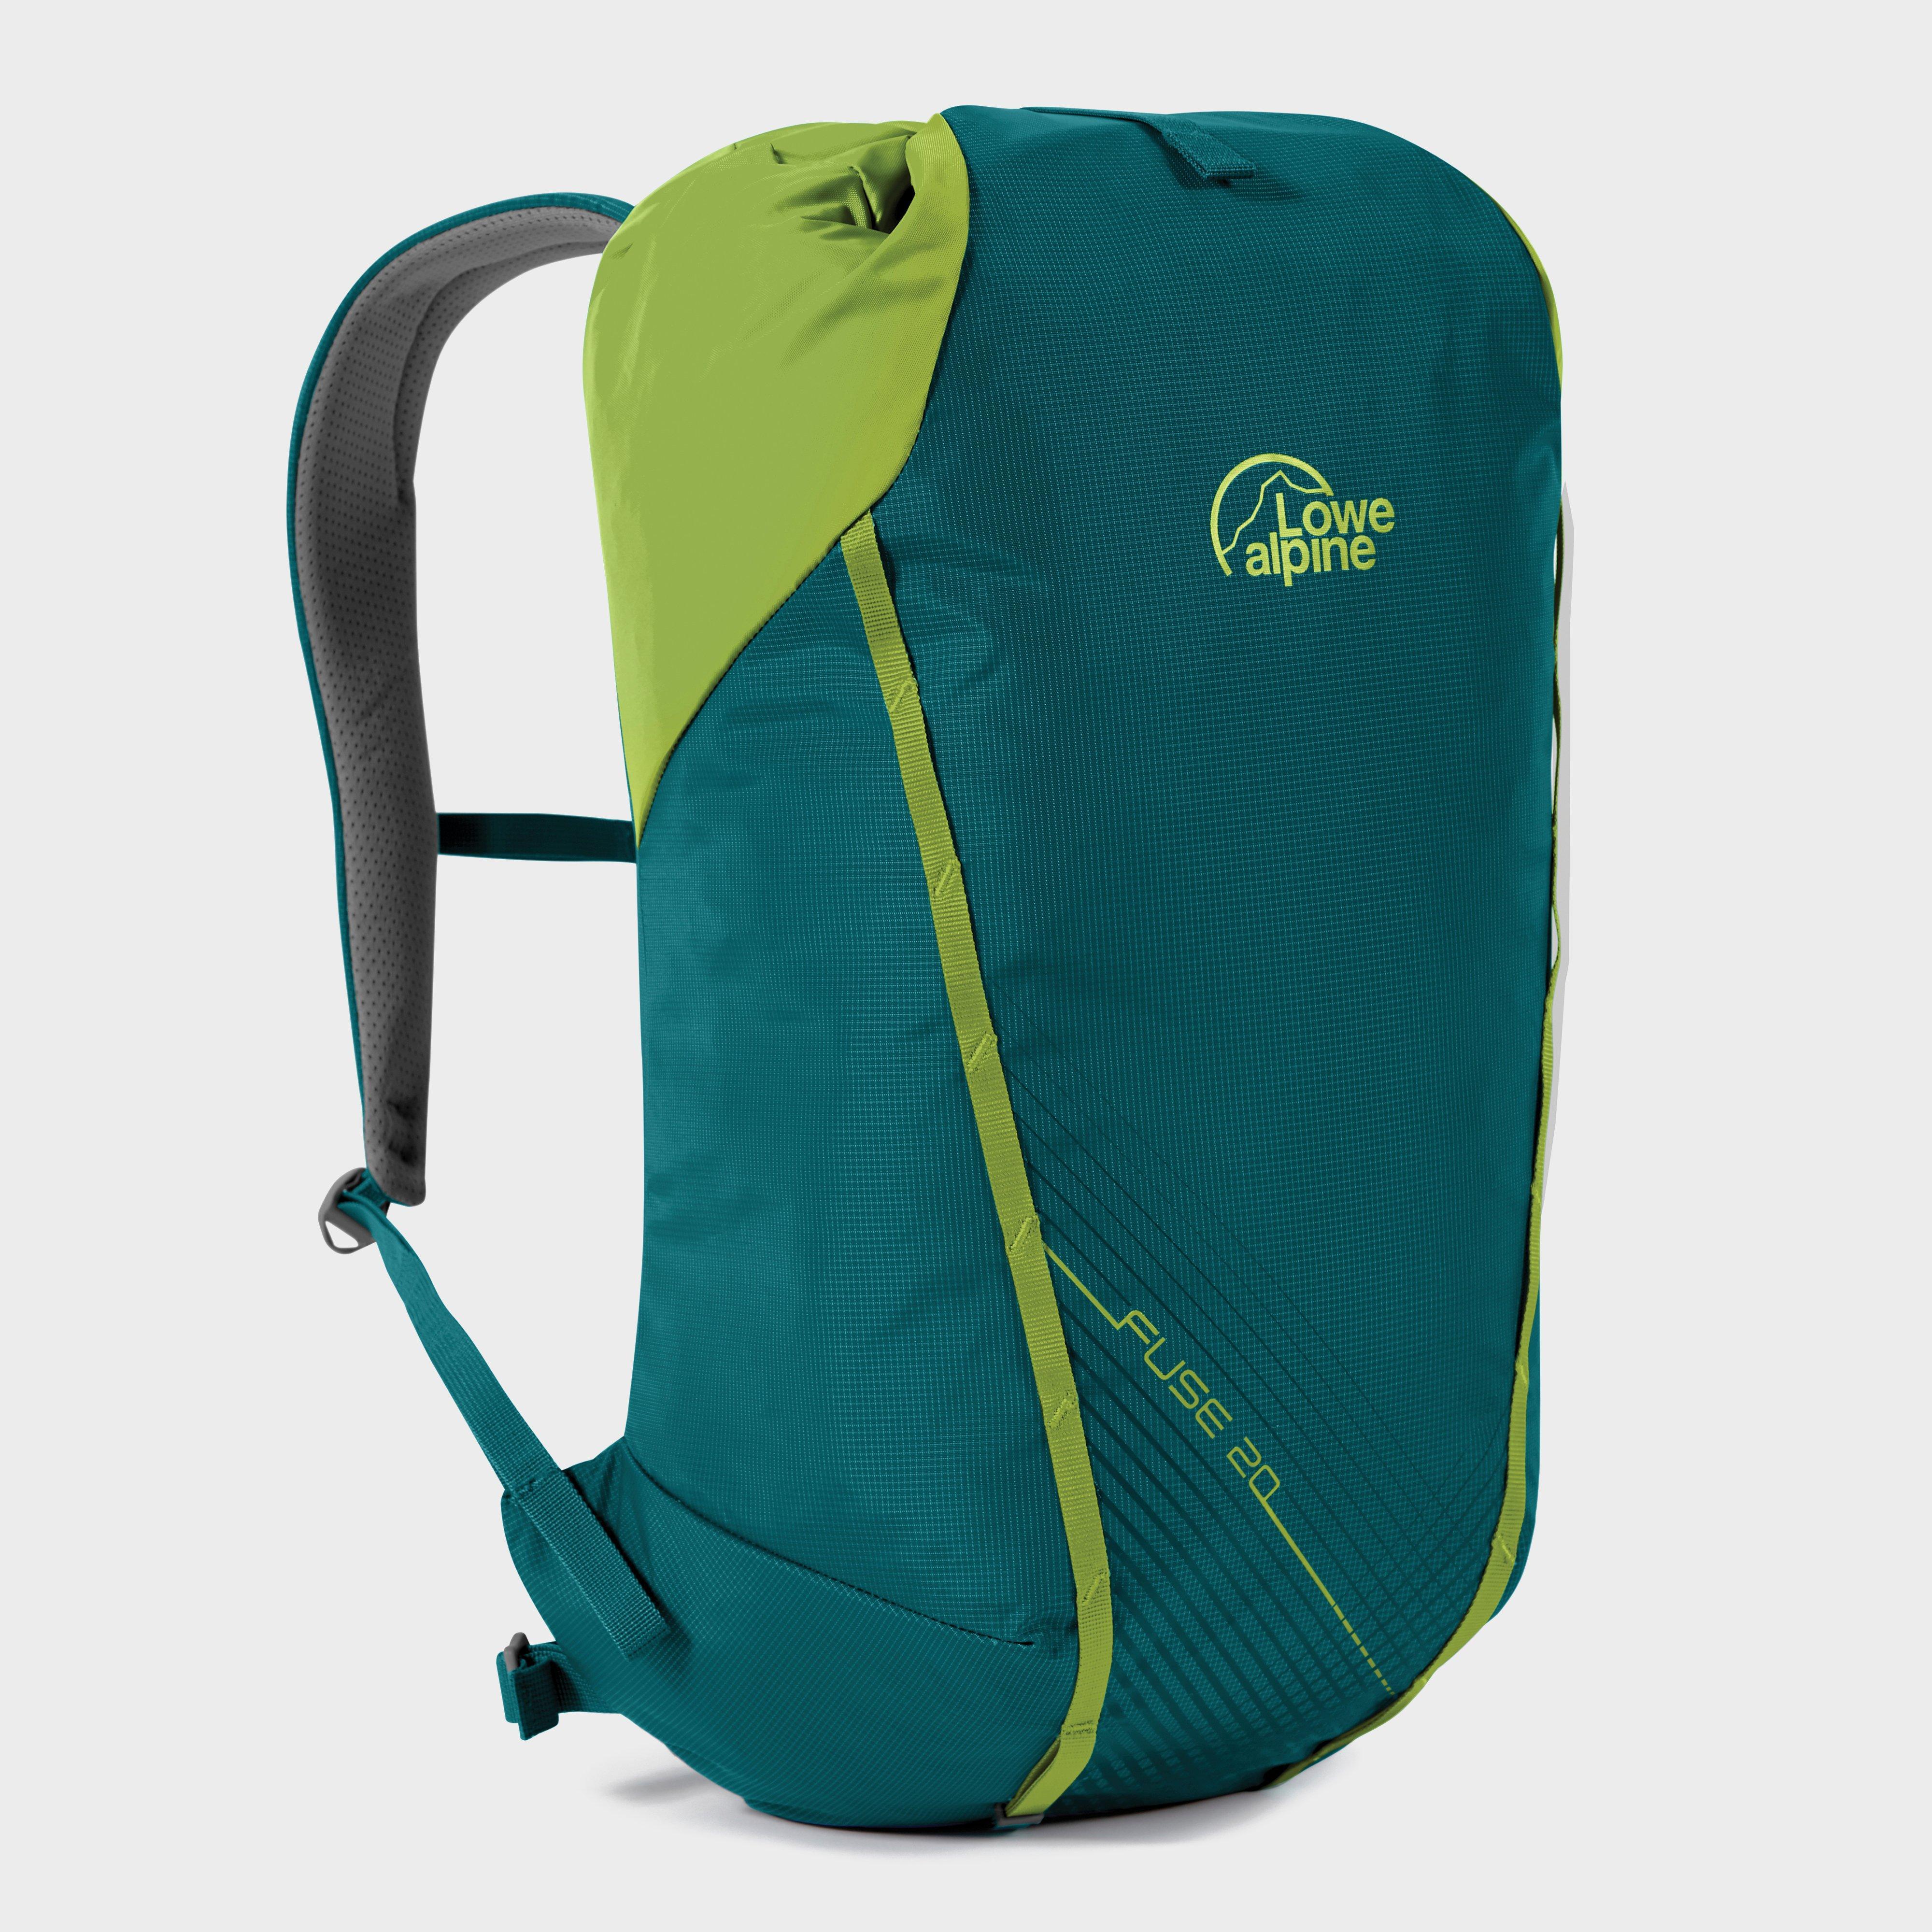 Lowe Alpine Fuse 20, Green